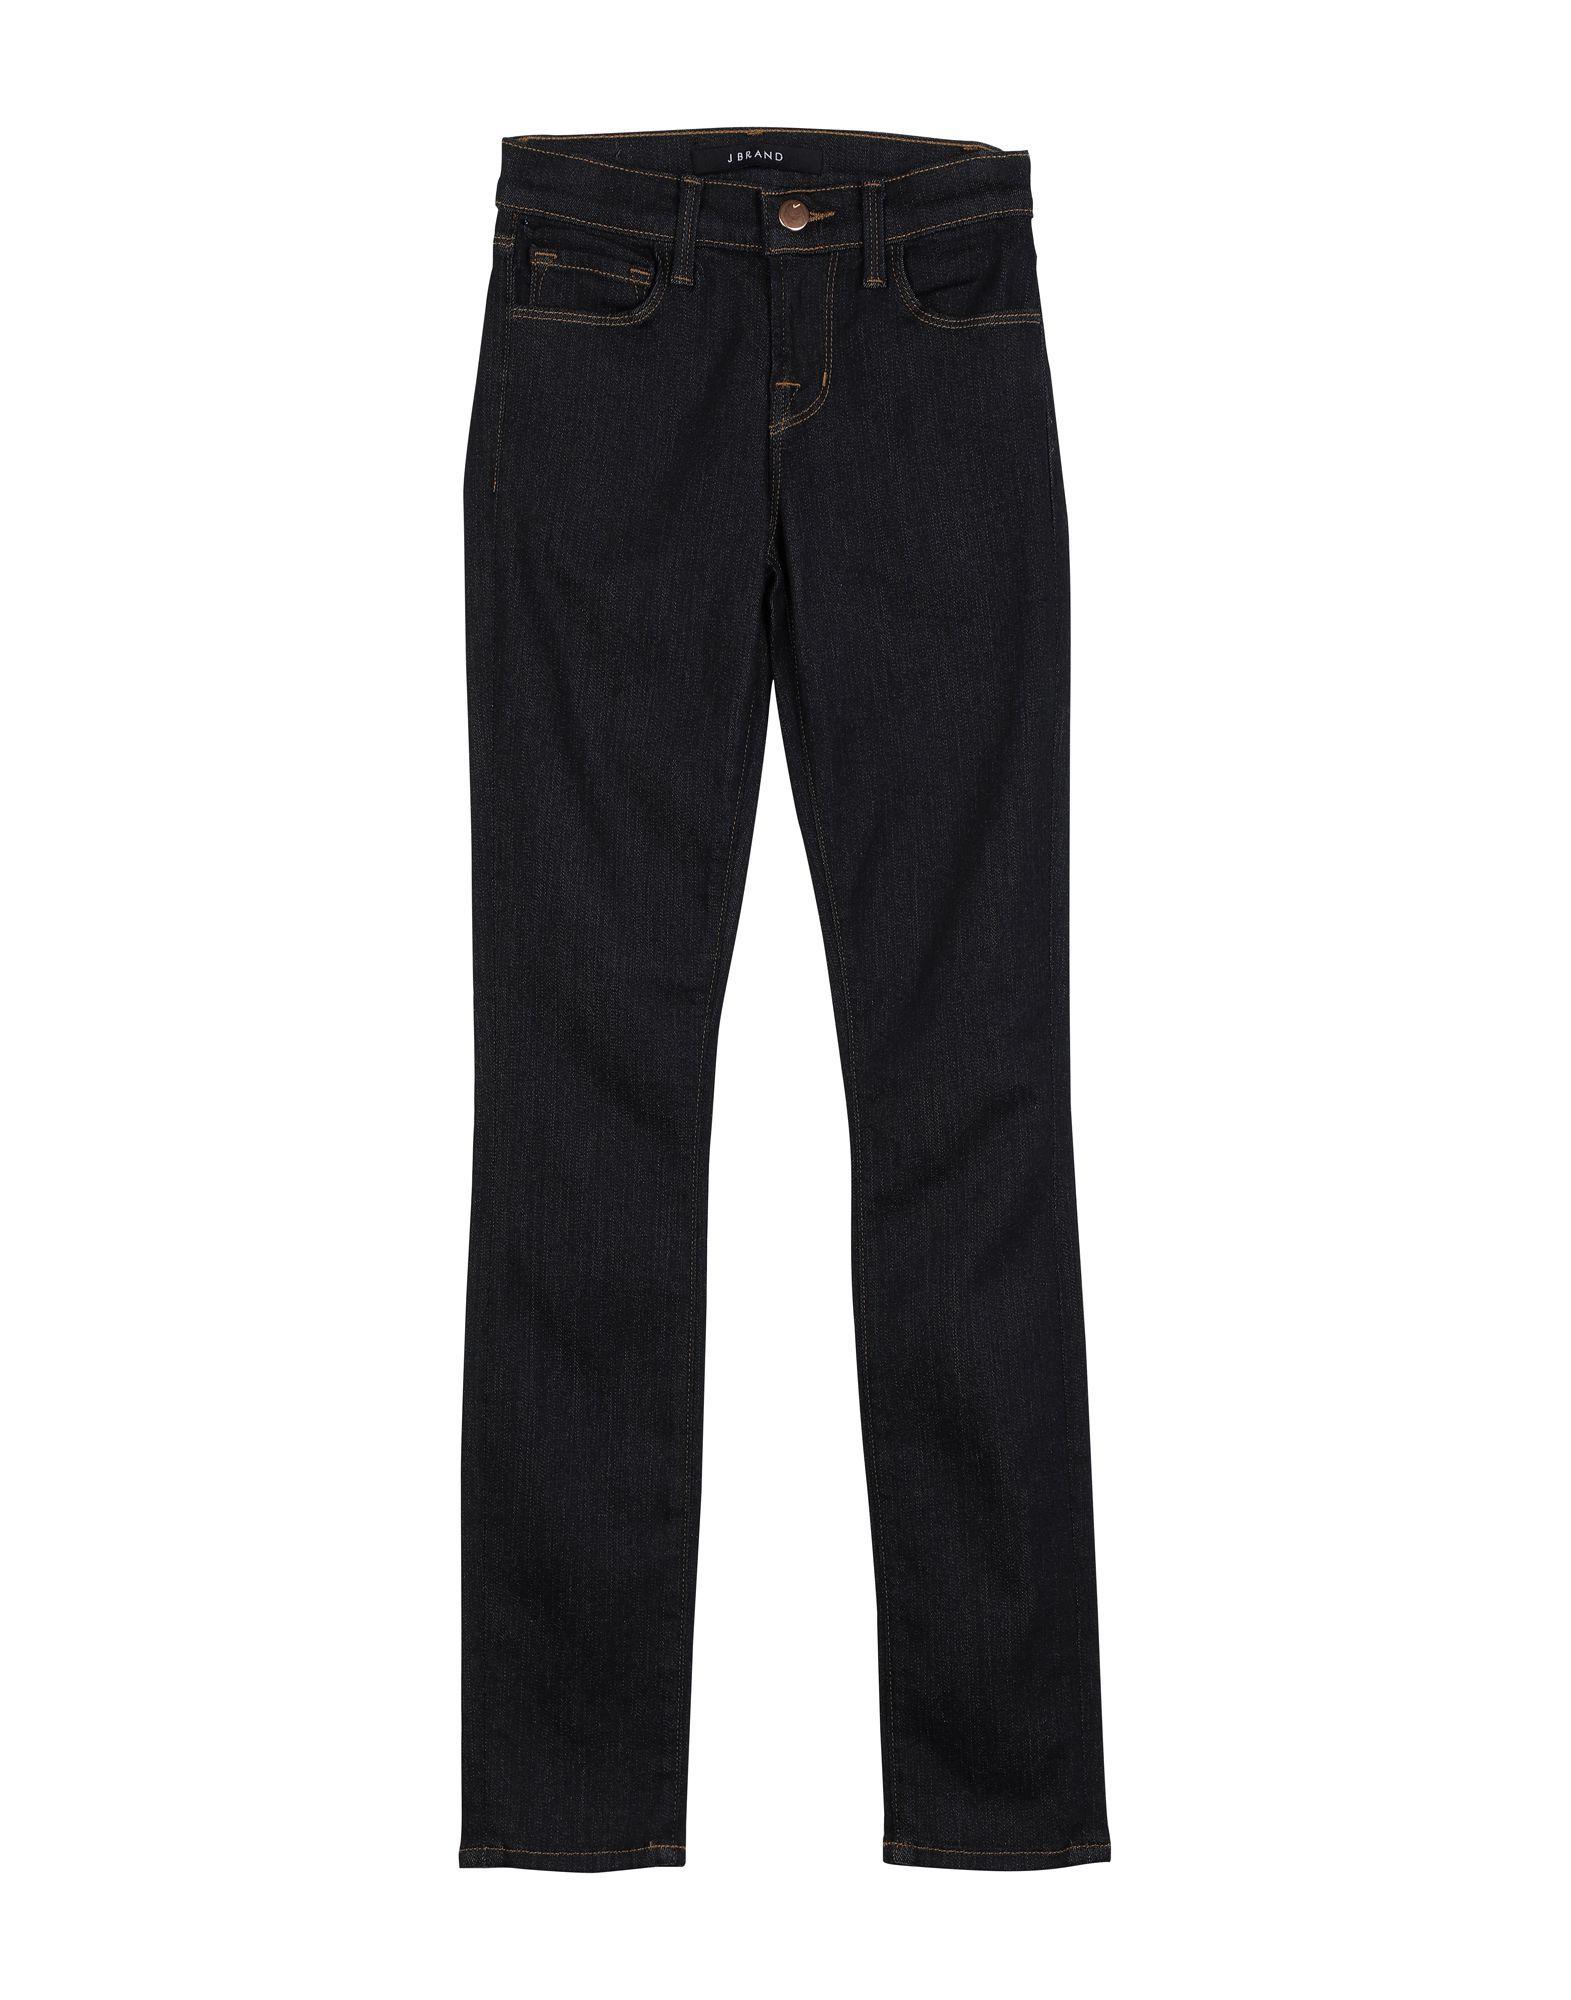 J Brand Blue Slim Fit Jeans